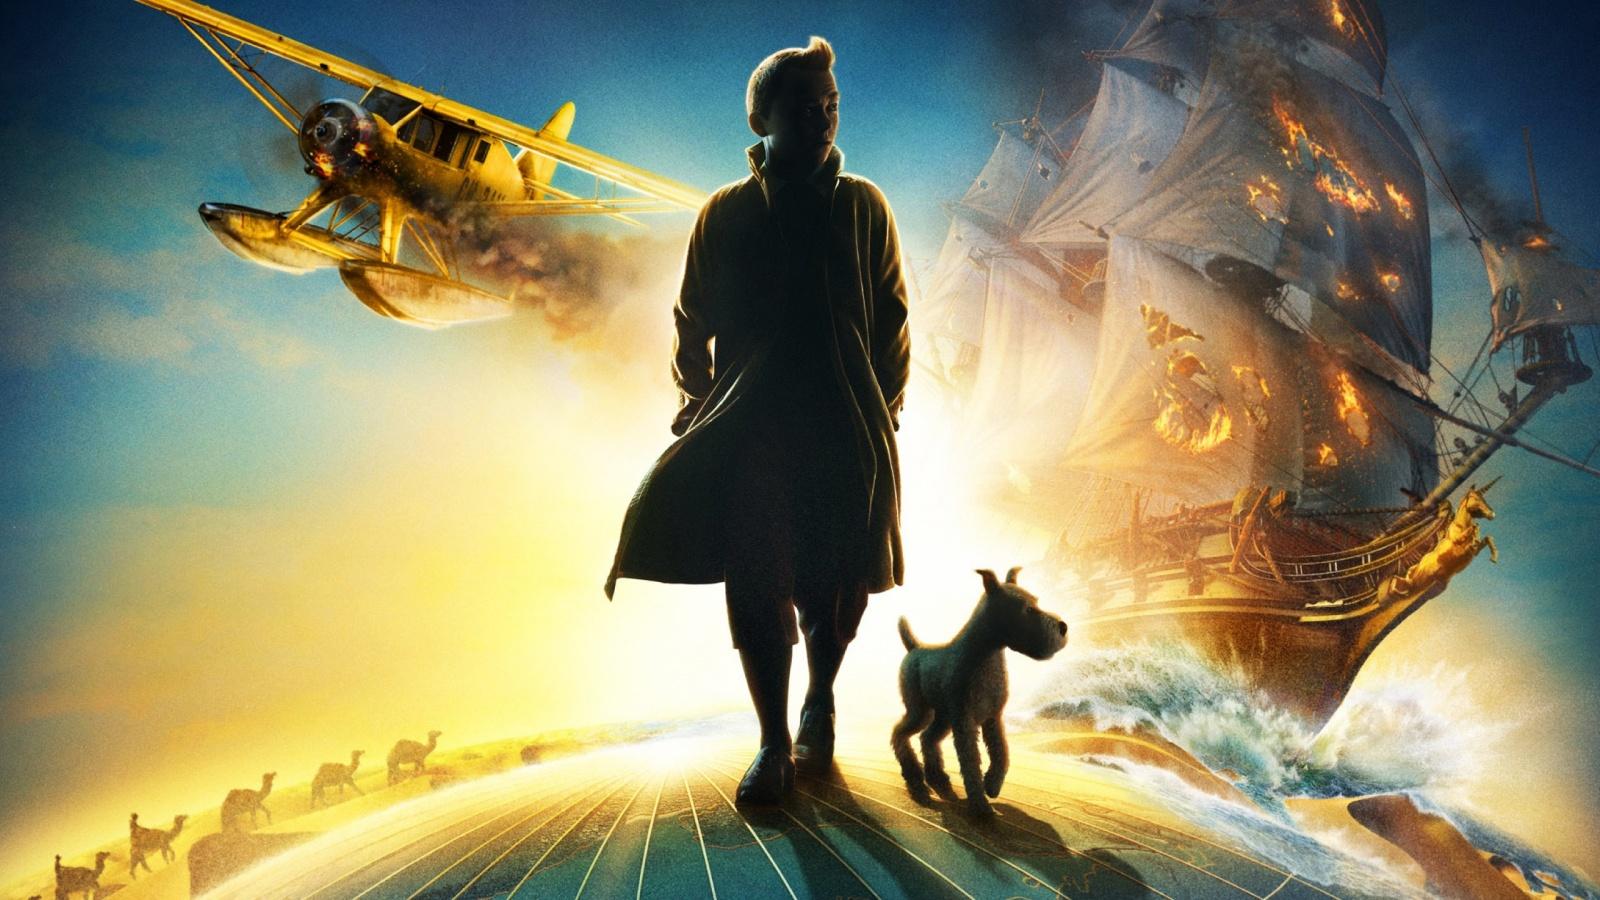 http://3.bp.blogspot.com/-ujUhOgqZRAM/TveU41fTmTI/AAAAAAAADrQ/ifxnZor6iSU/s1600/2011-The-Adventures-of-Tintin-Wallpapers-Movie-1600x900.jpg